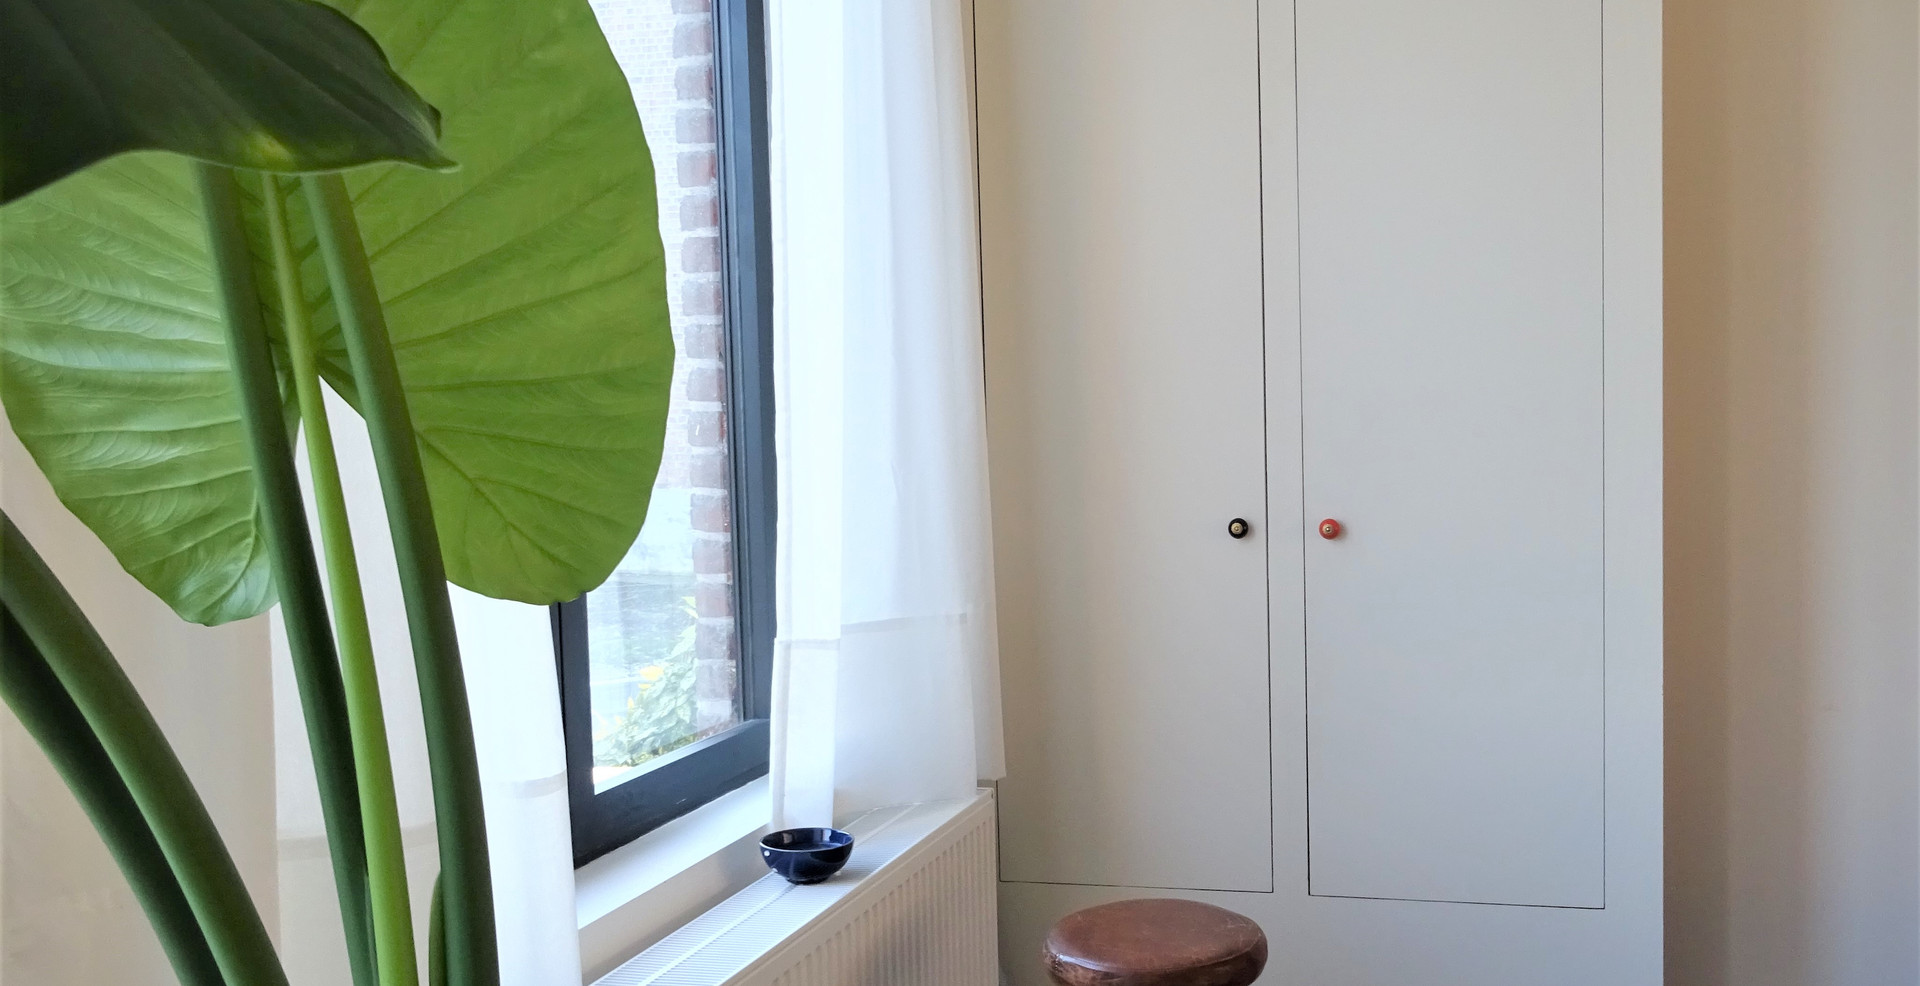 maatwerk kast elektriciteit wit plant mooi vintage inbouwkast